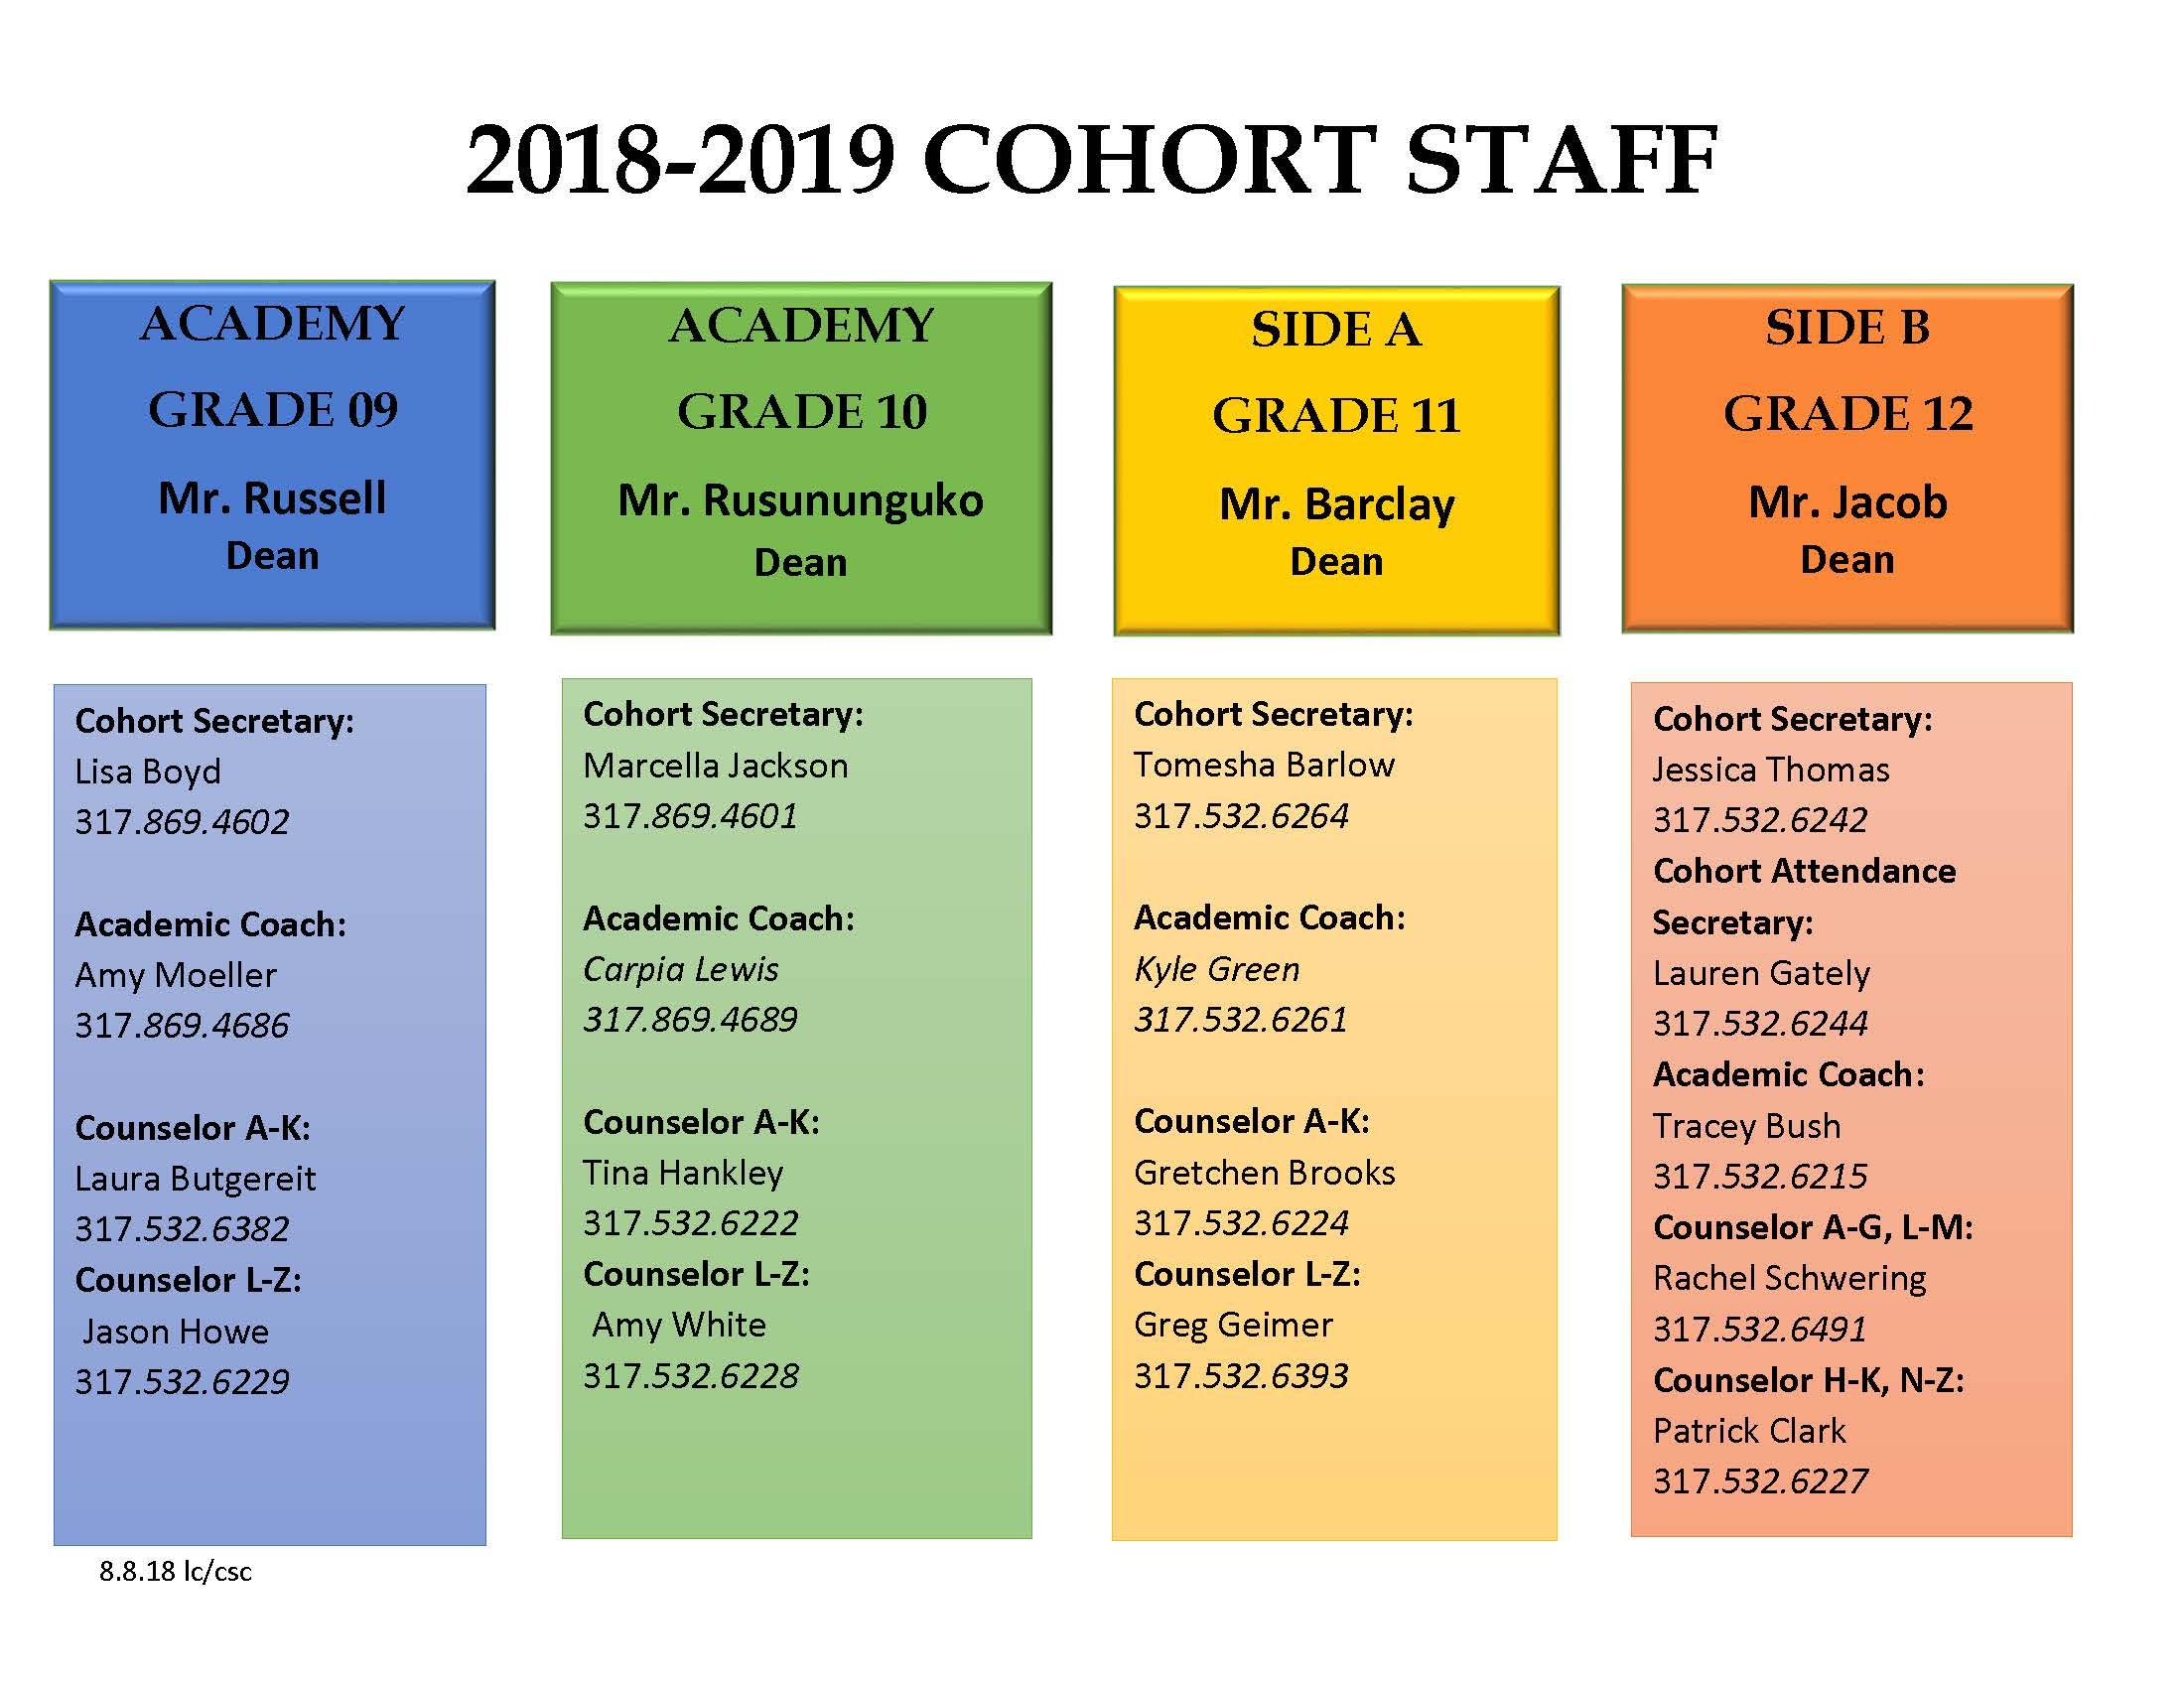 2018-2019 WCHS Cohort Matrix